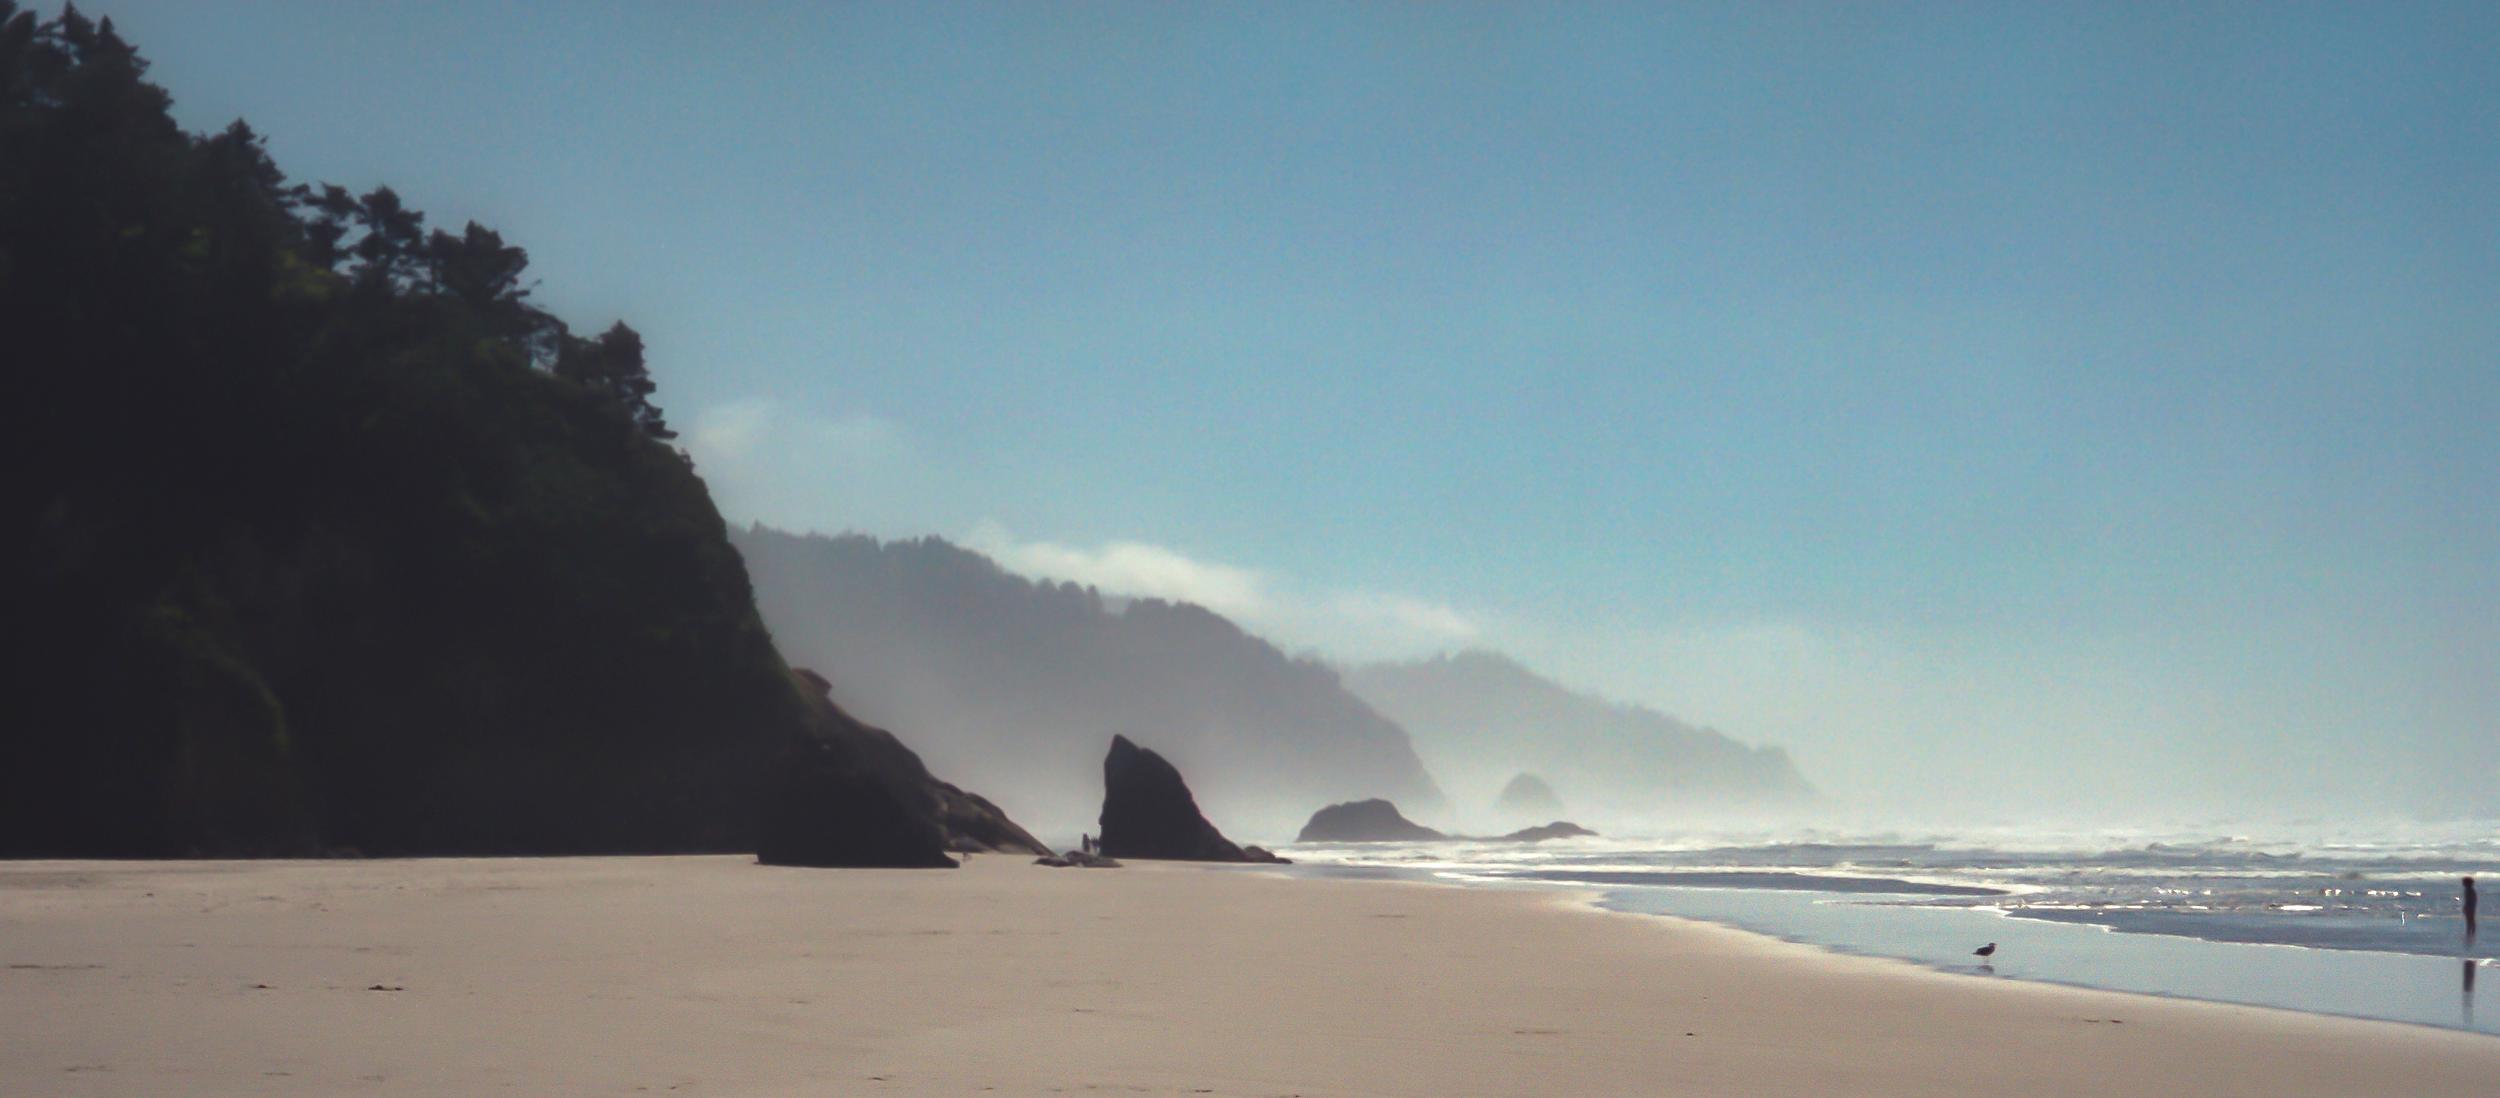 Cannon Beach, Oregon. August 1989. Restored from damaged Kodak Gold 200 35mm film negative.